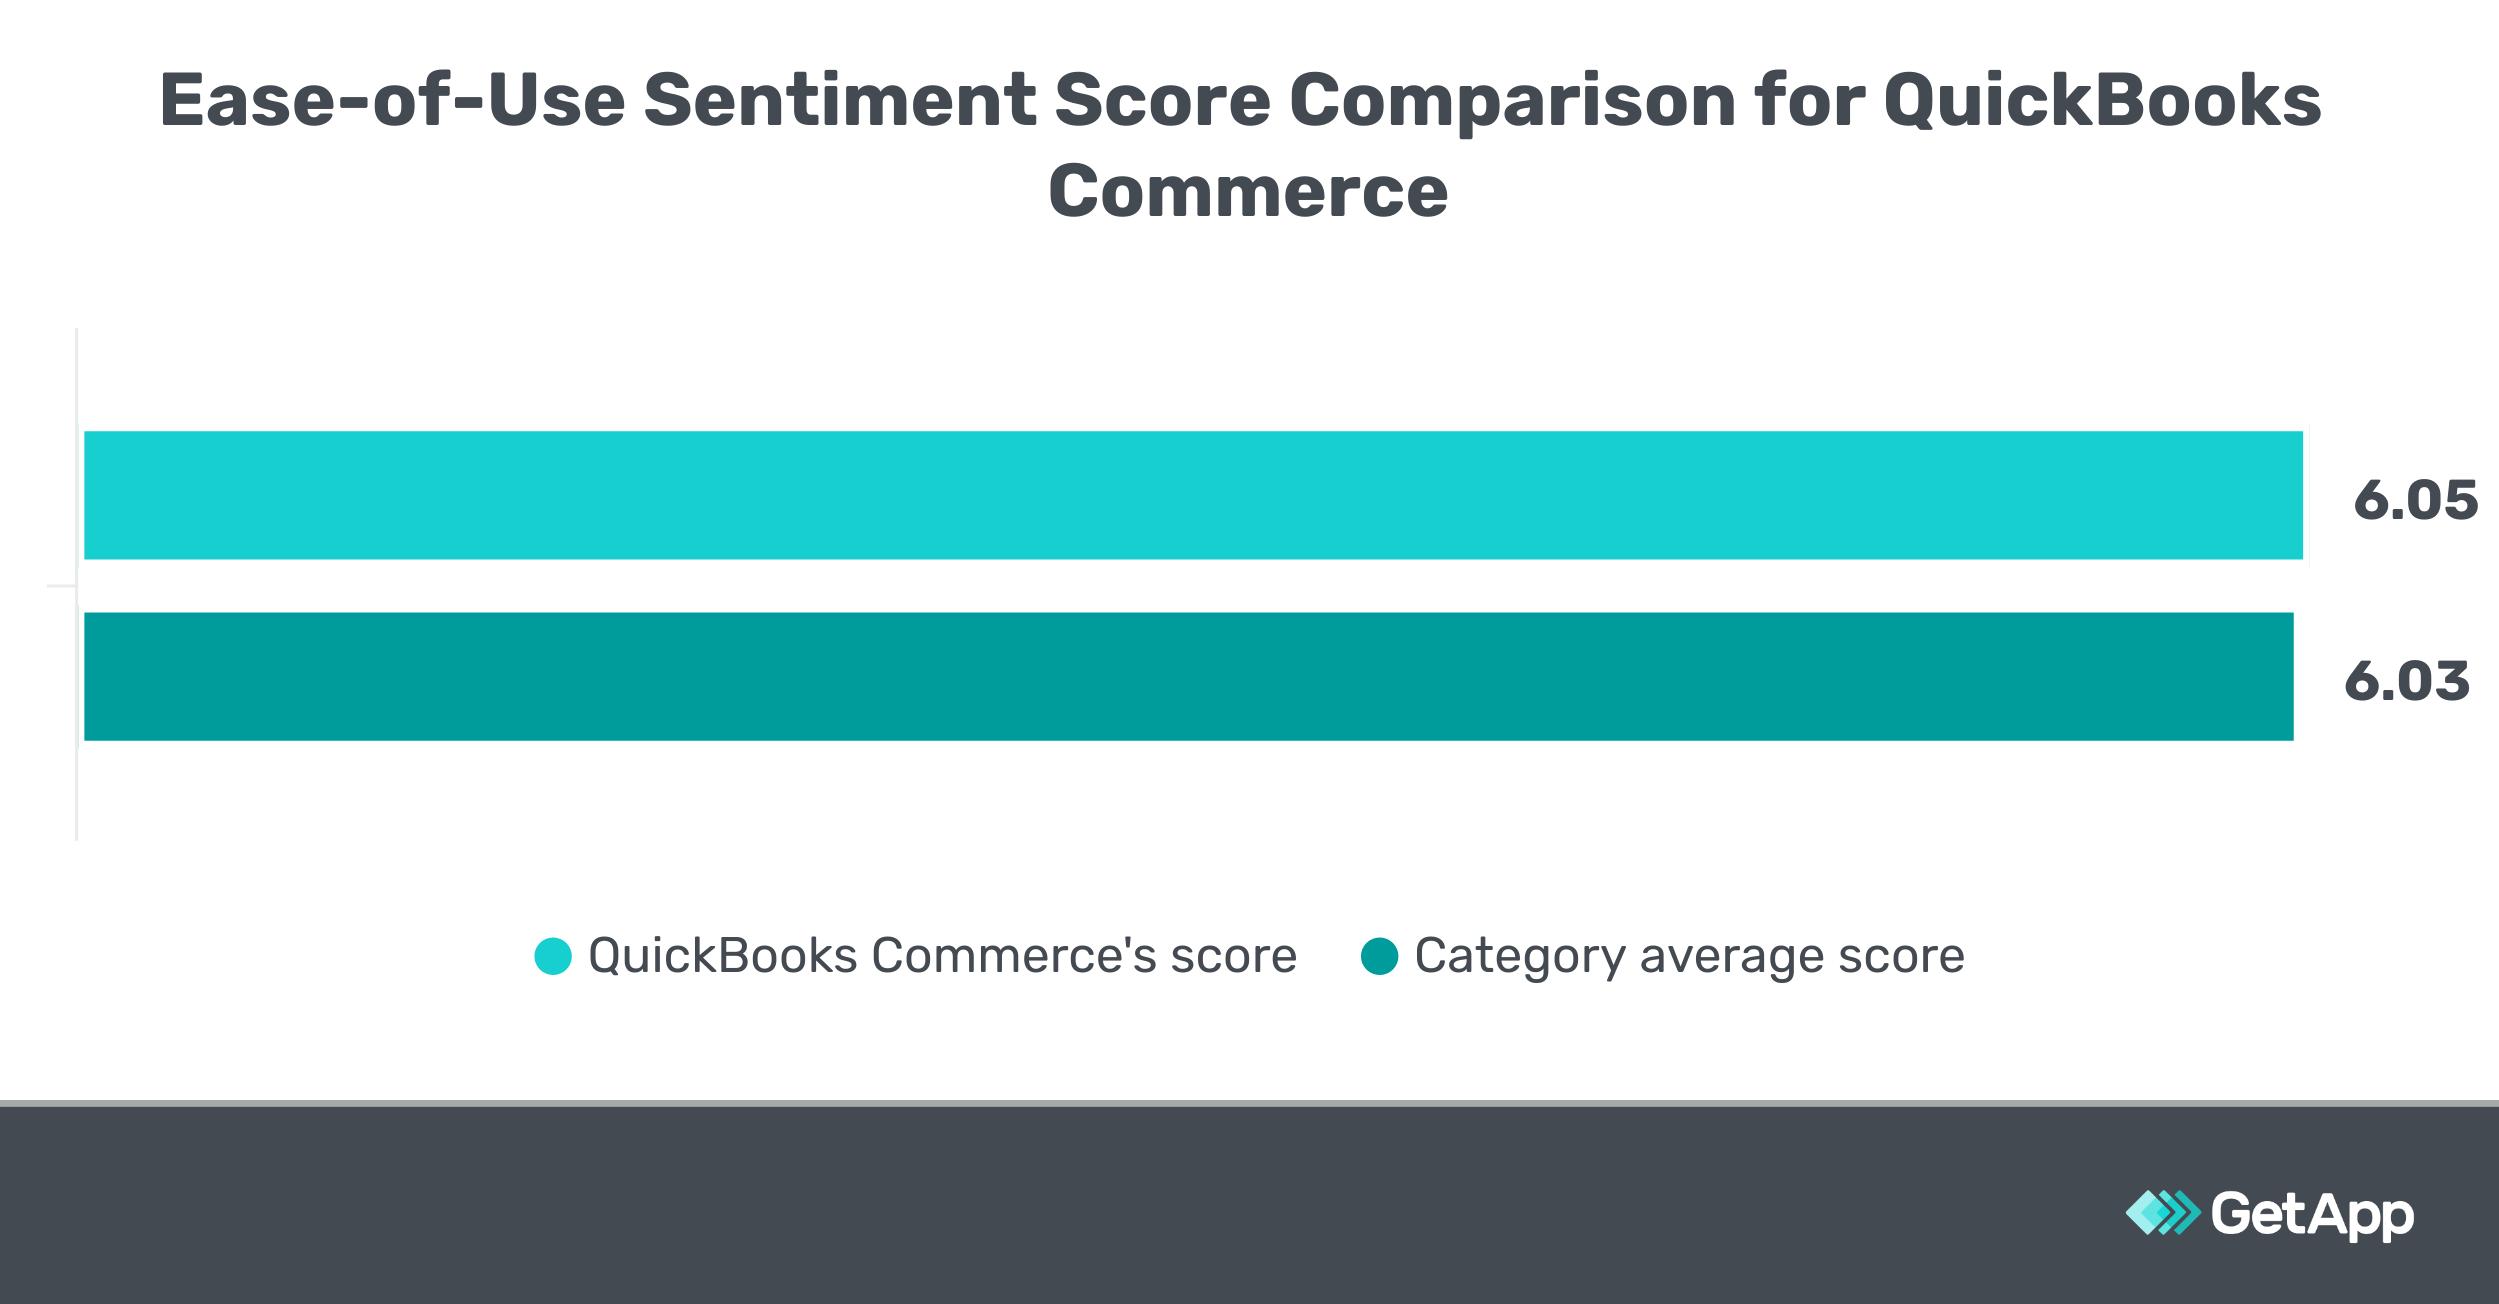 Ease of Use Sentiment Score Comparison for QuickBooks Commerce